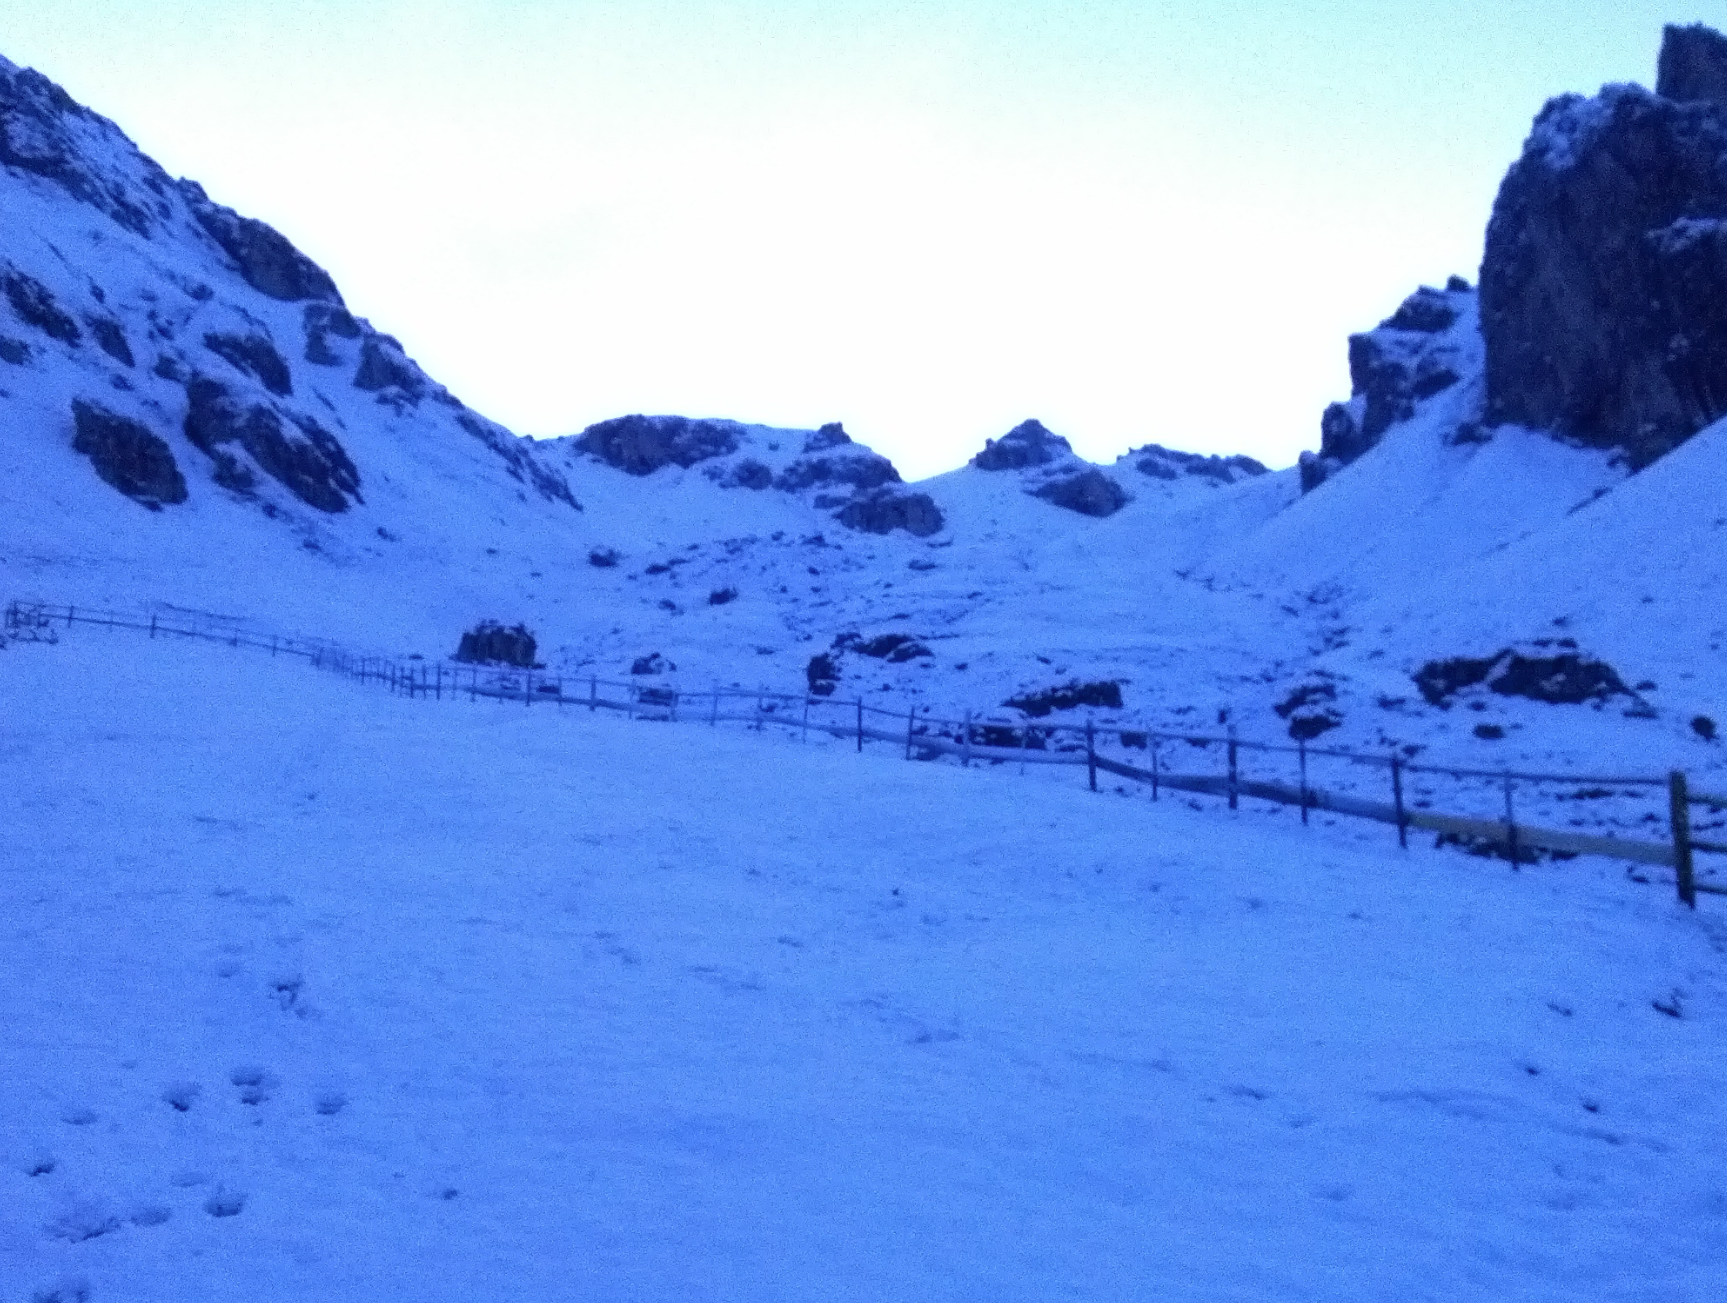 Wörndle Loch nach Schneefall